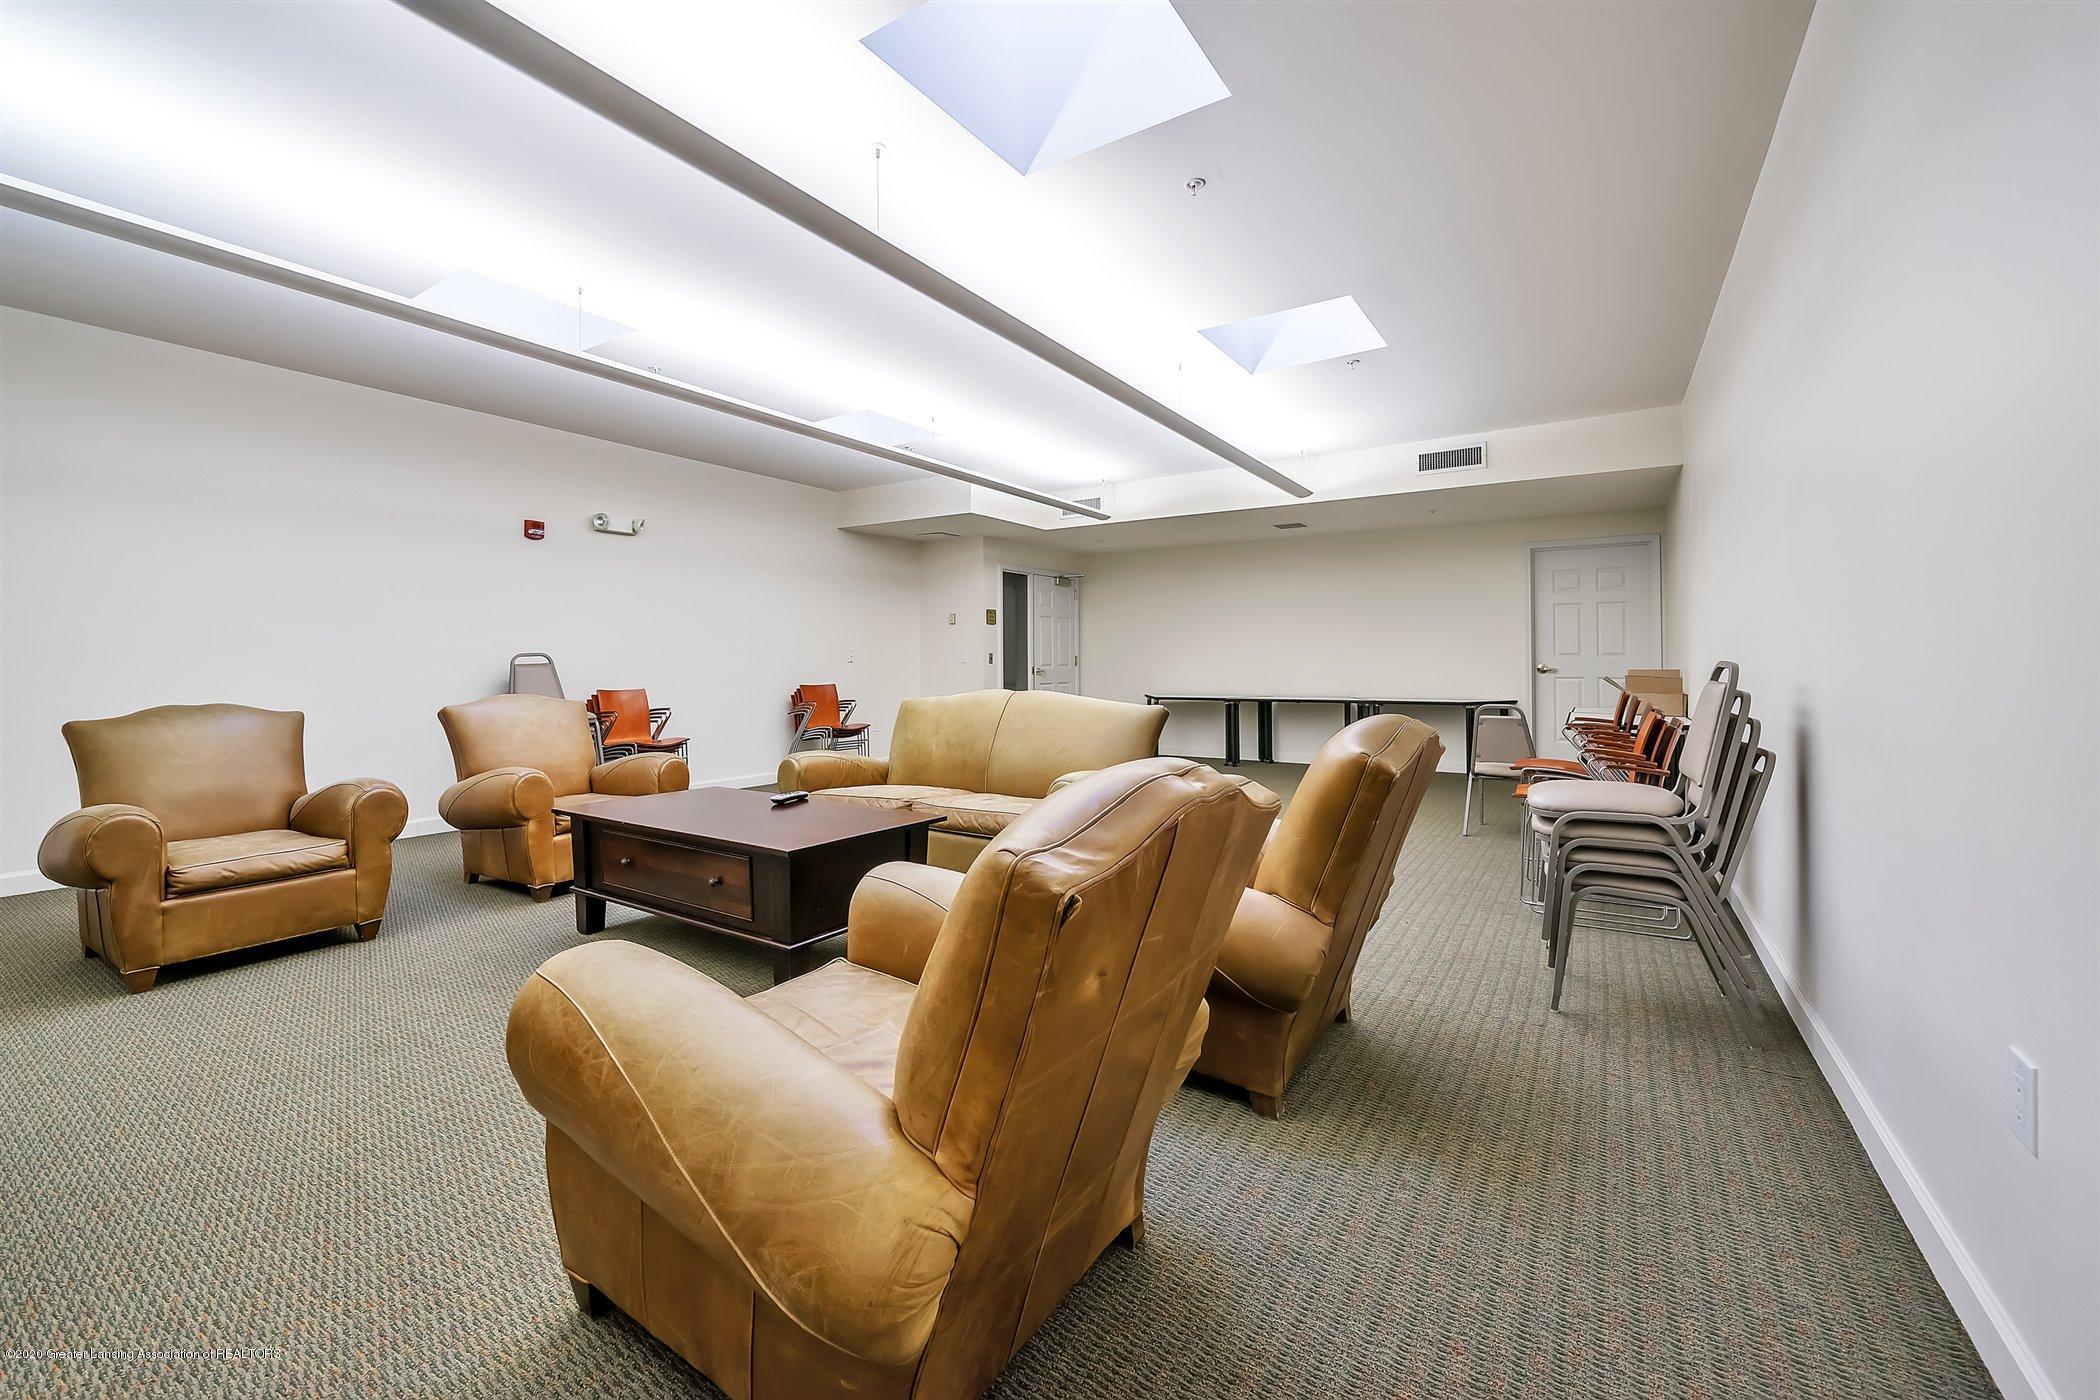 220 M. A. C. Ave Apt 409 - Club Room - 32